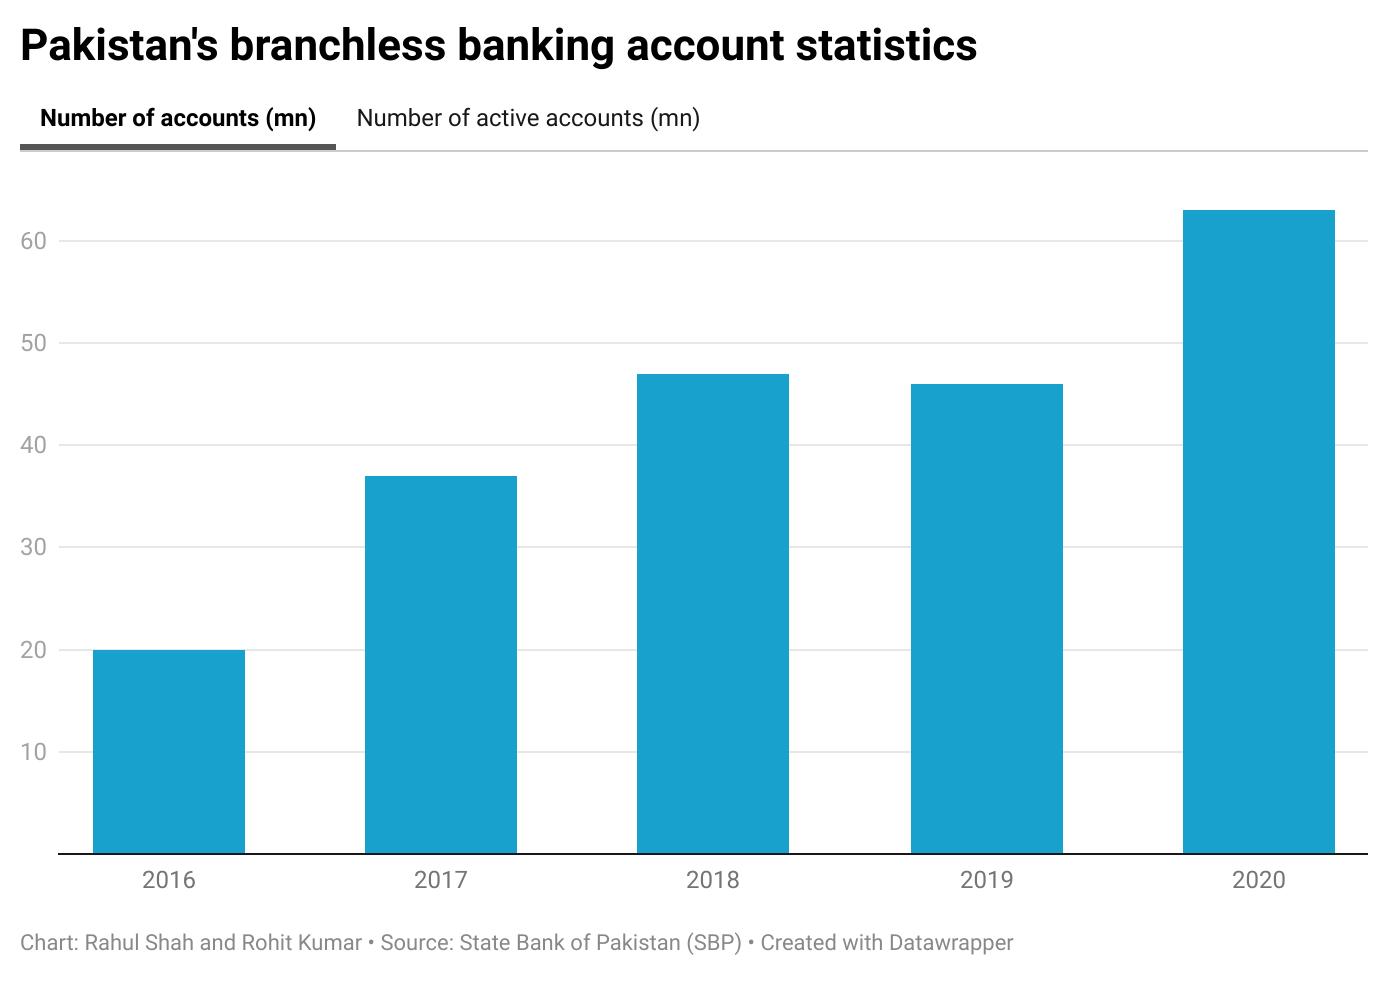 Pakistan's branchless banking account statistics